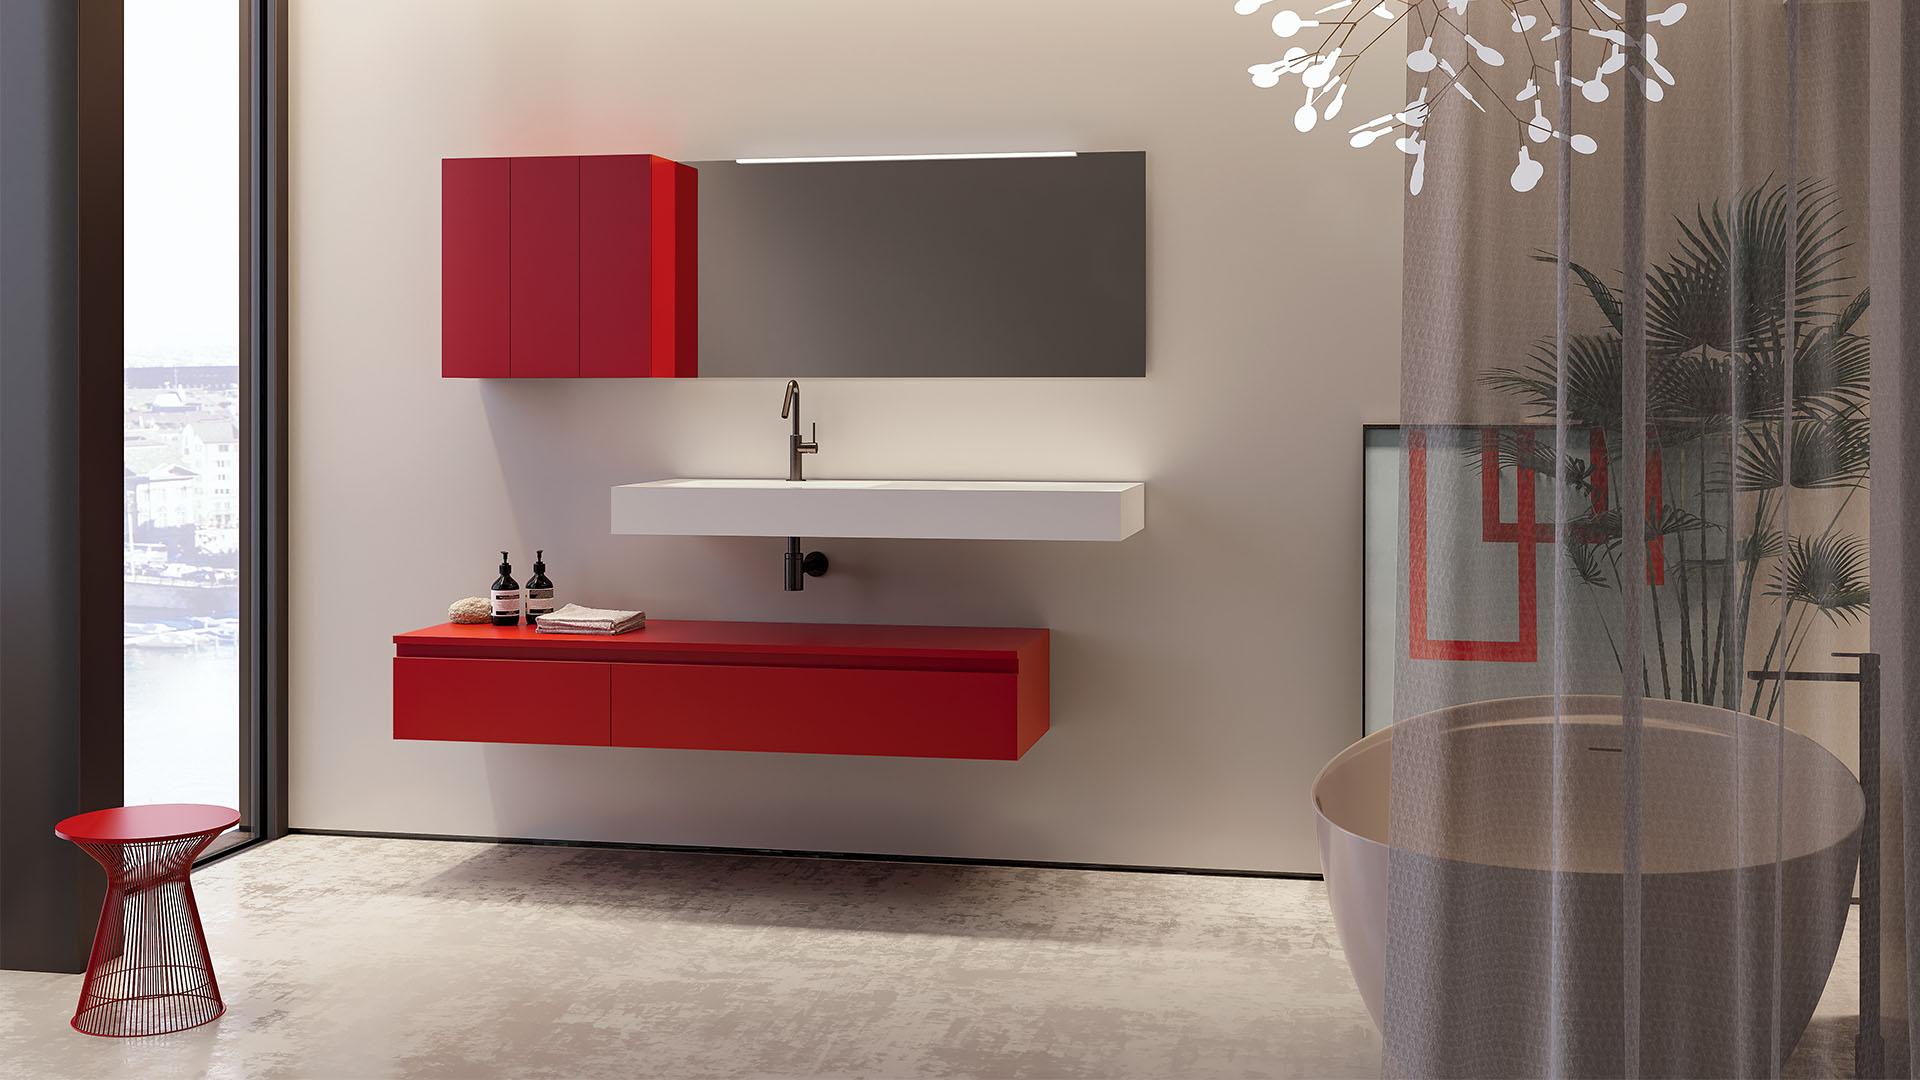 Bathroom Happy 06 - Licor Design